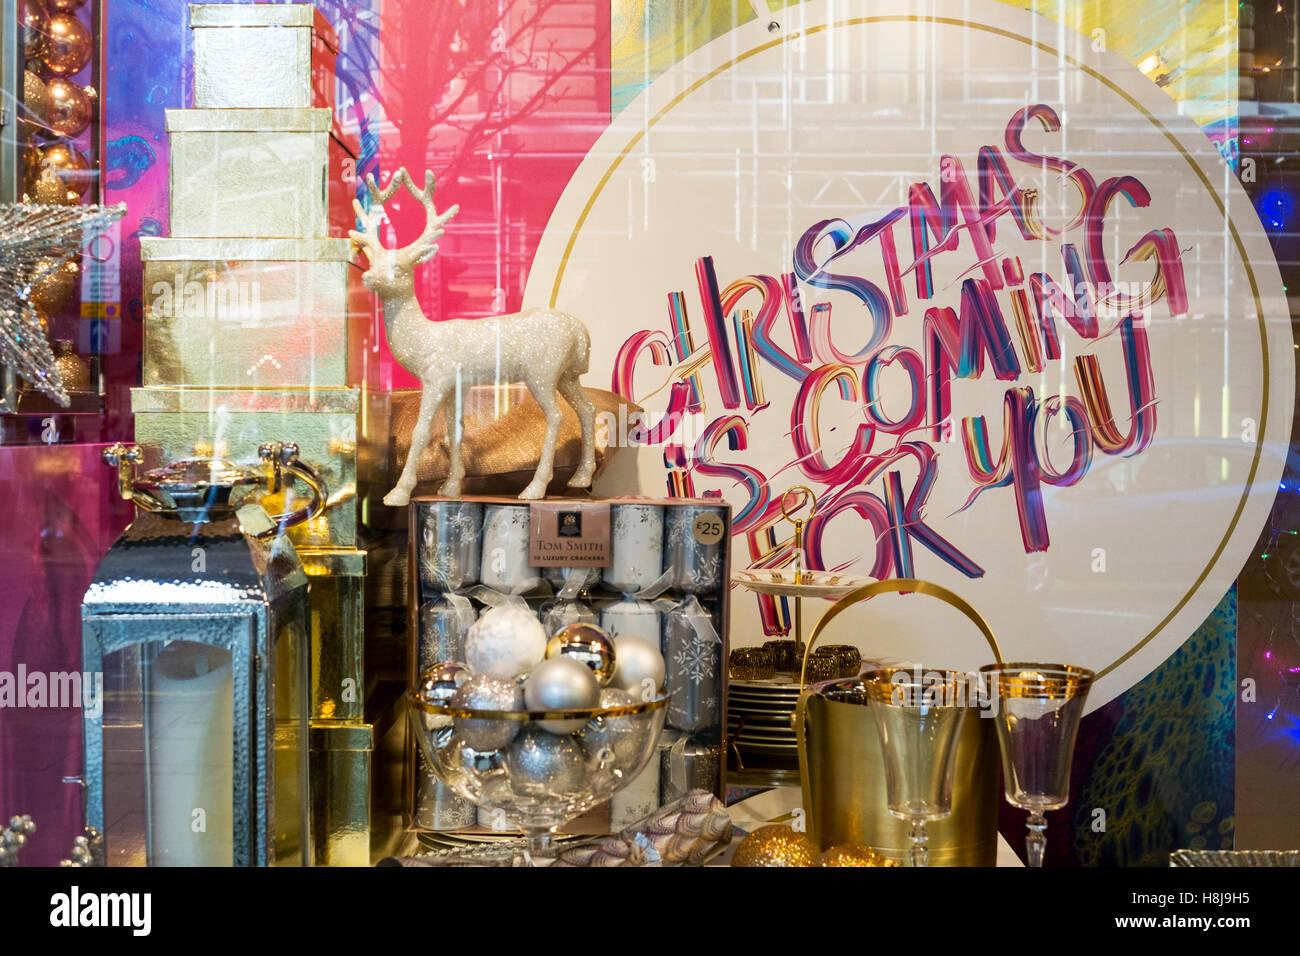 Christmas shop window display, Manchester, UK. - Stock Image